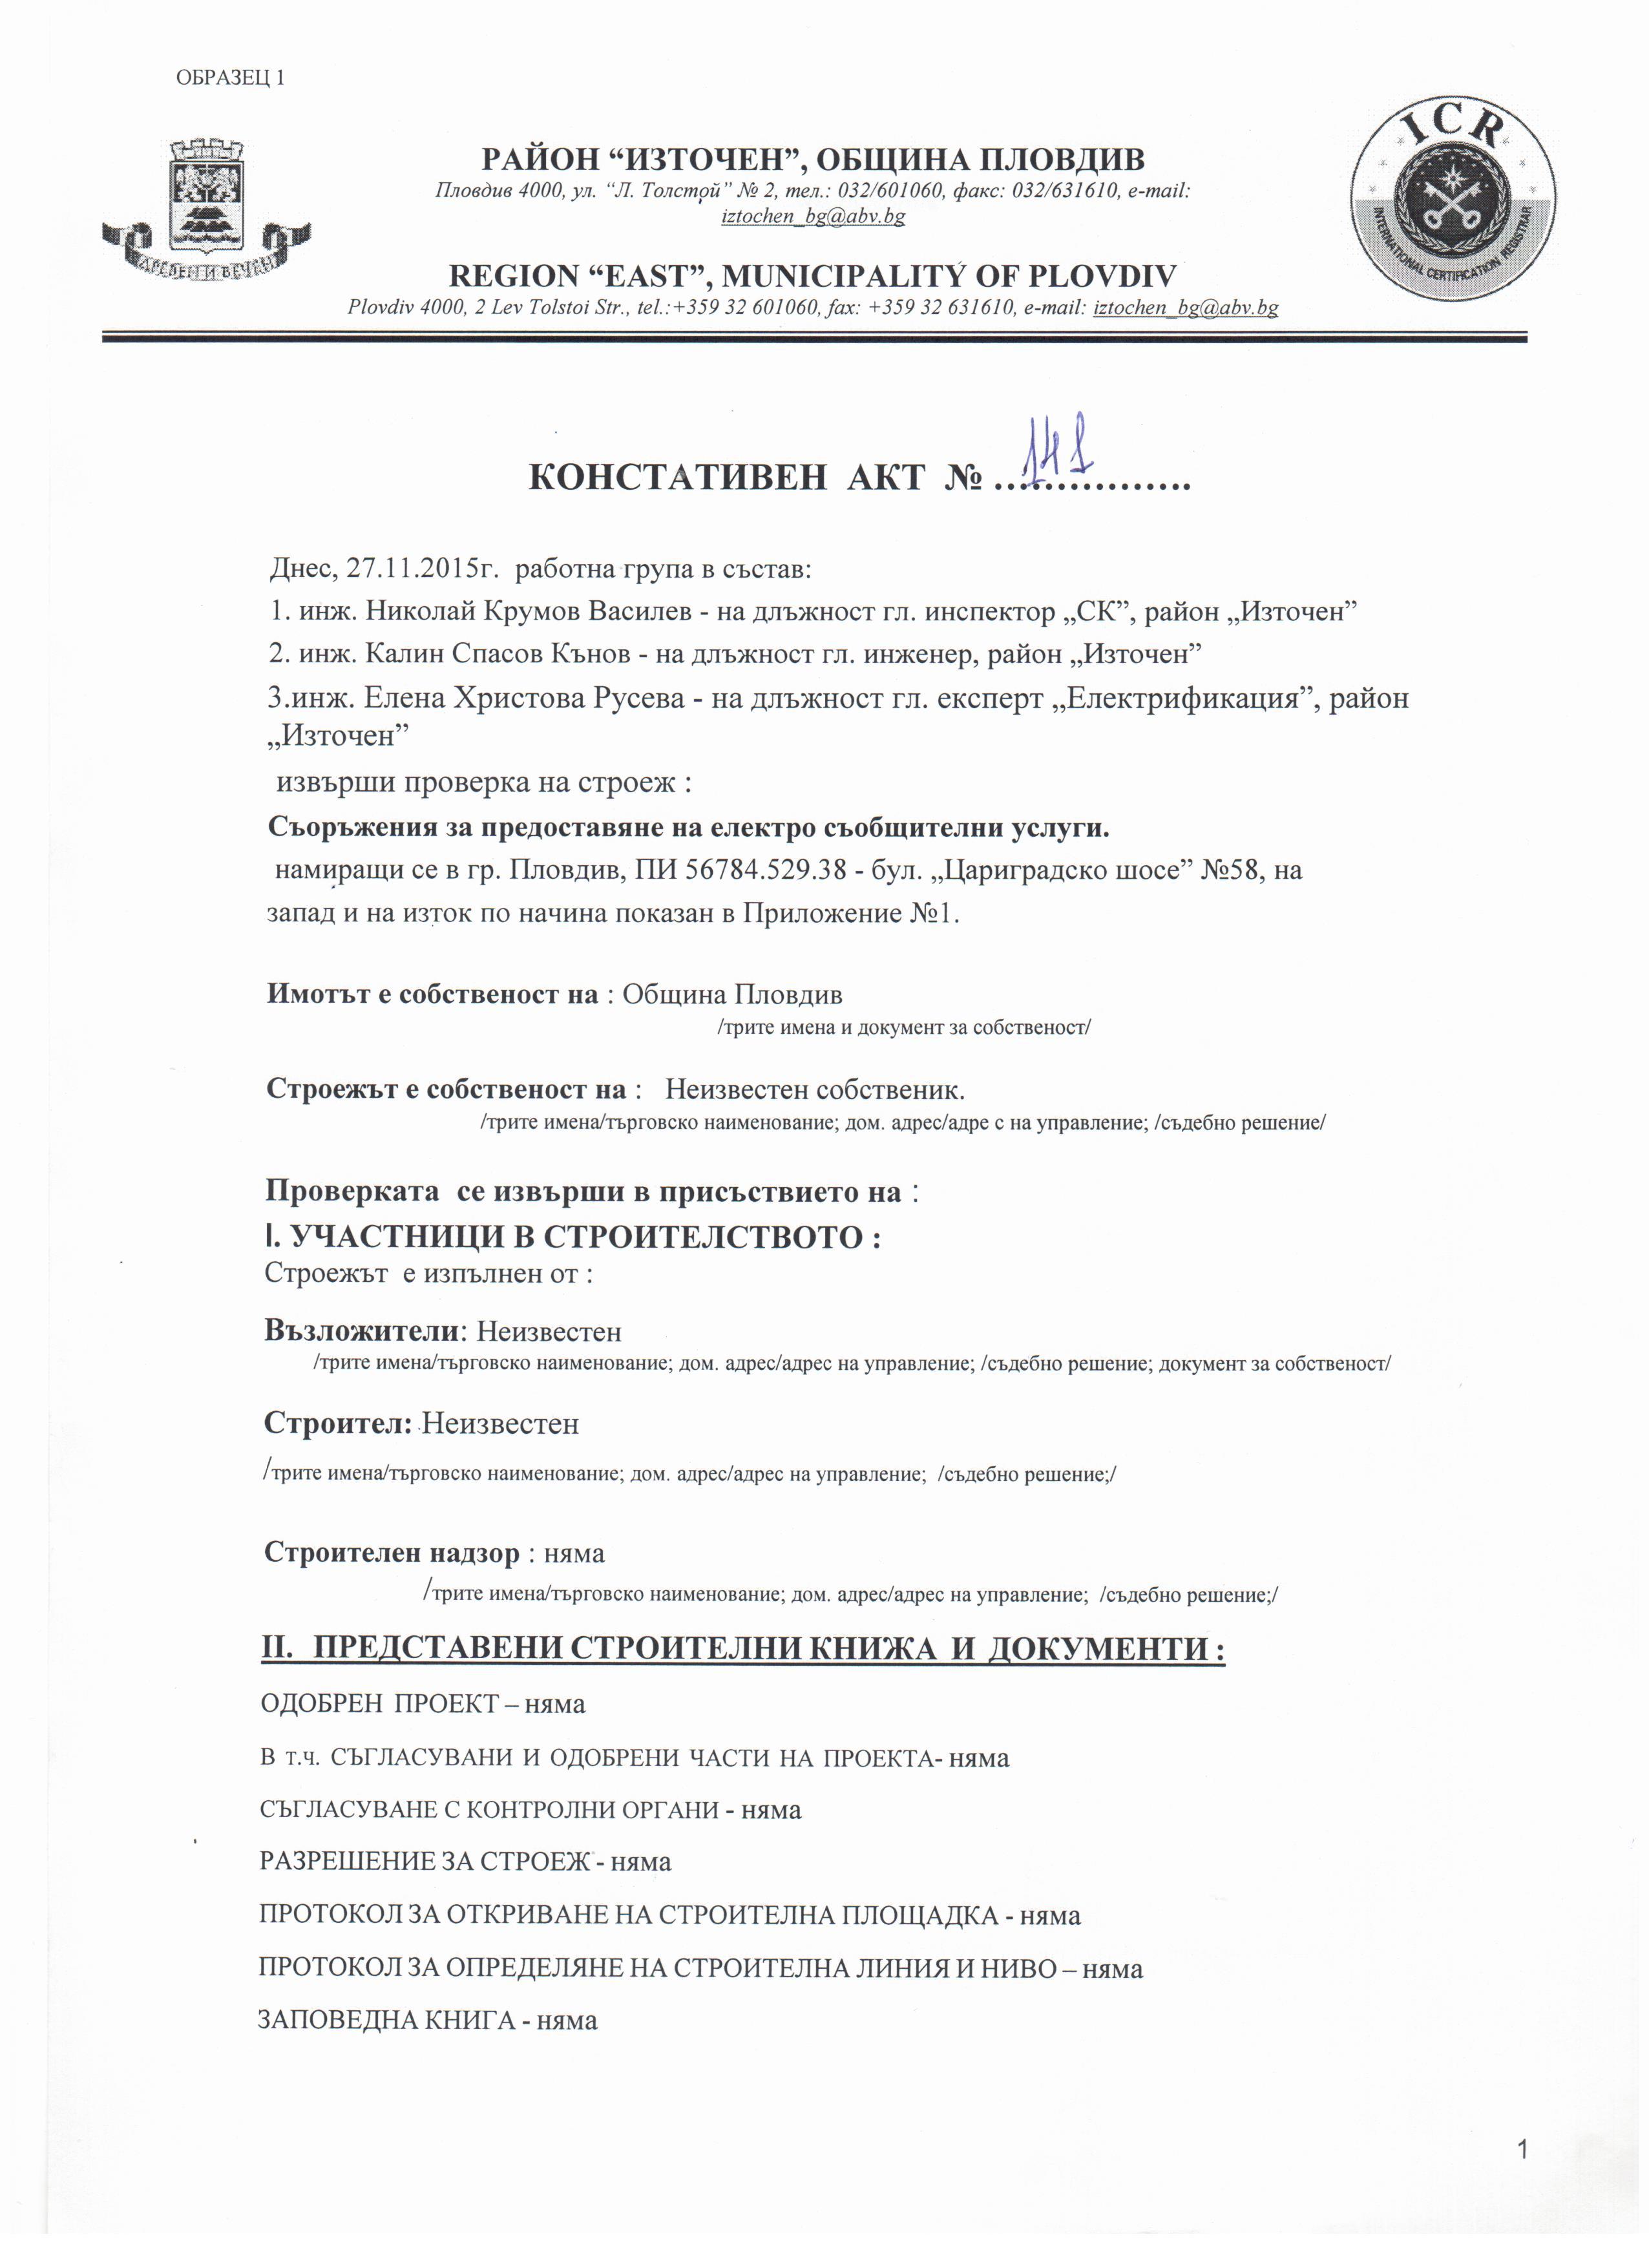 KONSTATIVEN_AKT_№141